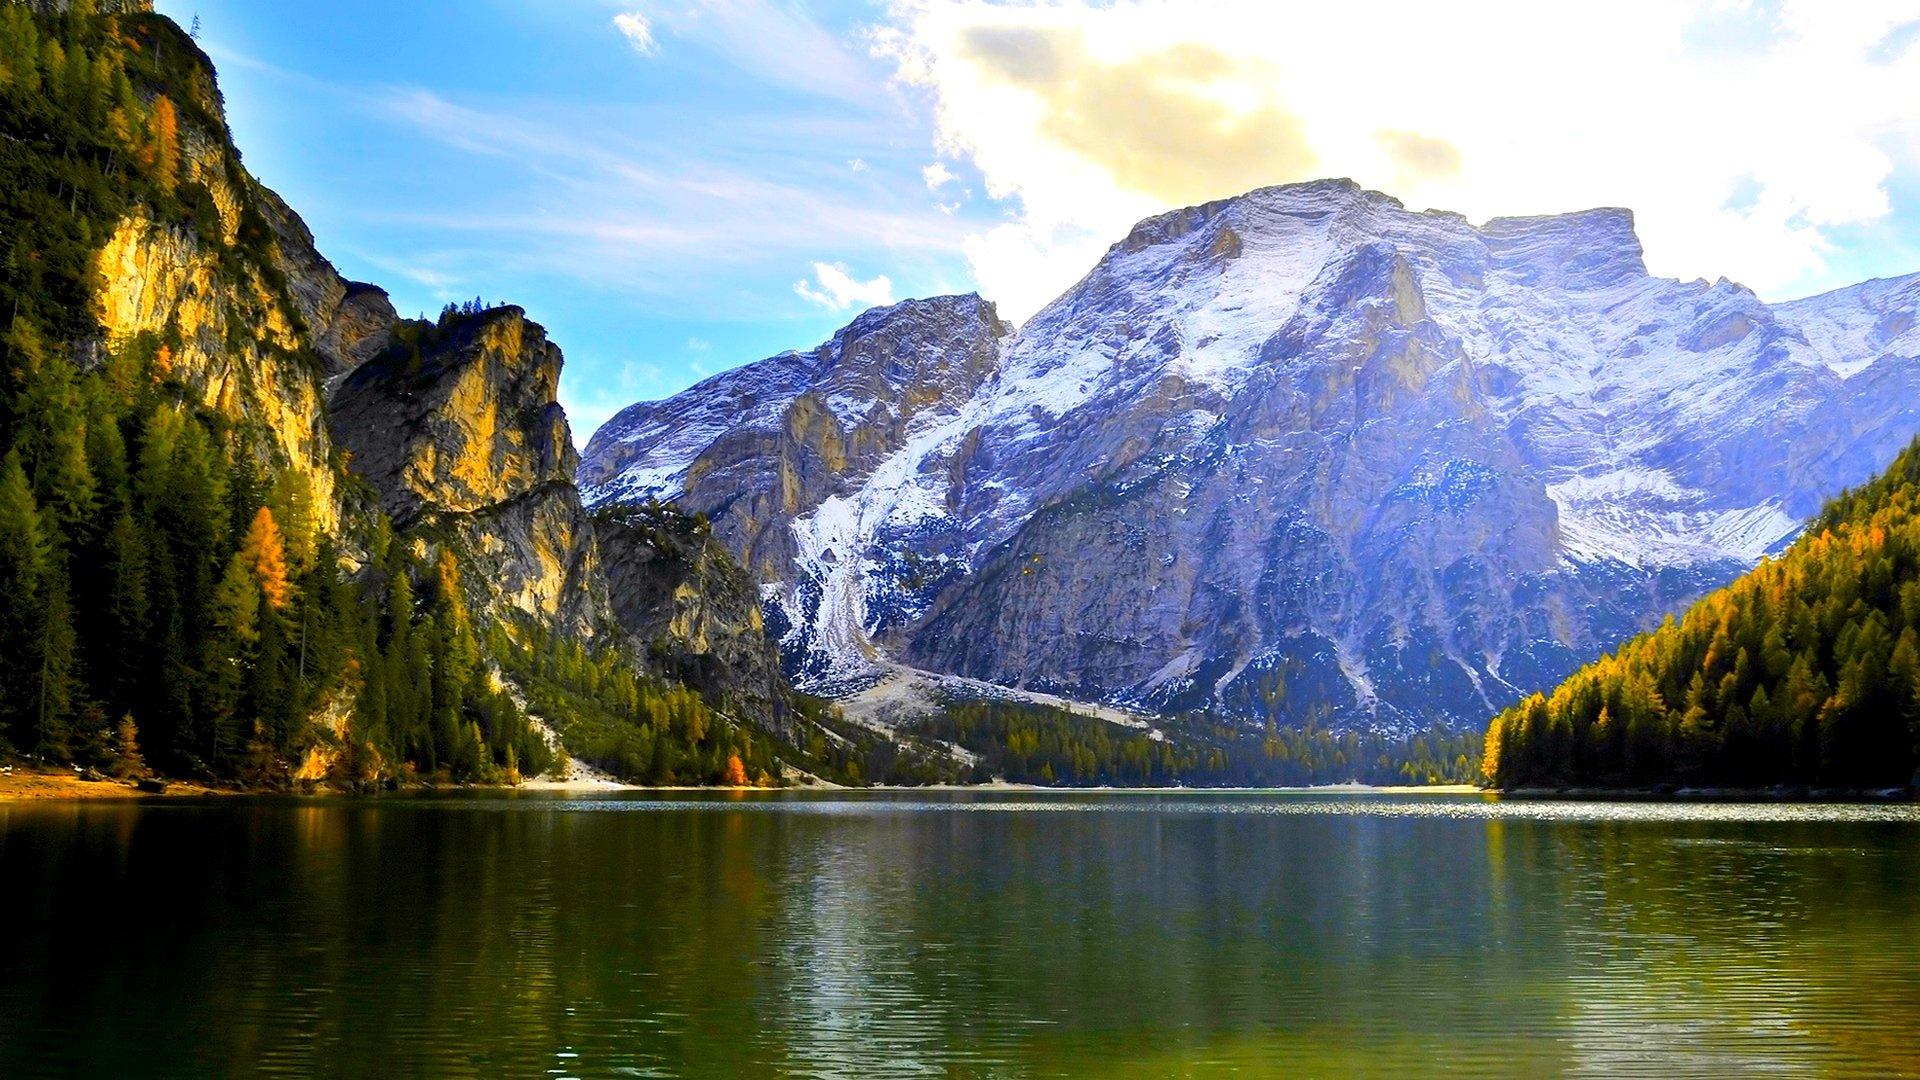 Rocky Mountain Sunset Wallpapers Full HD Bhstormcom 1920x1080